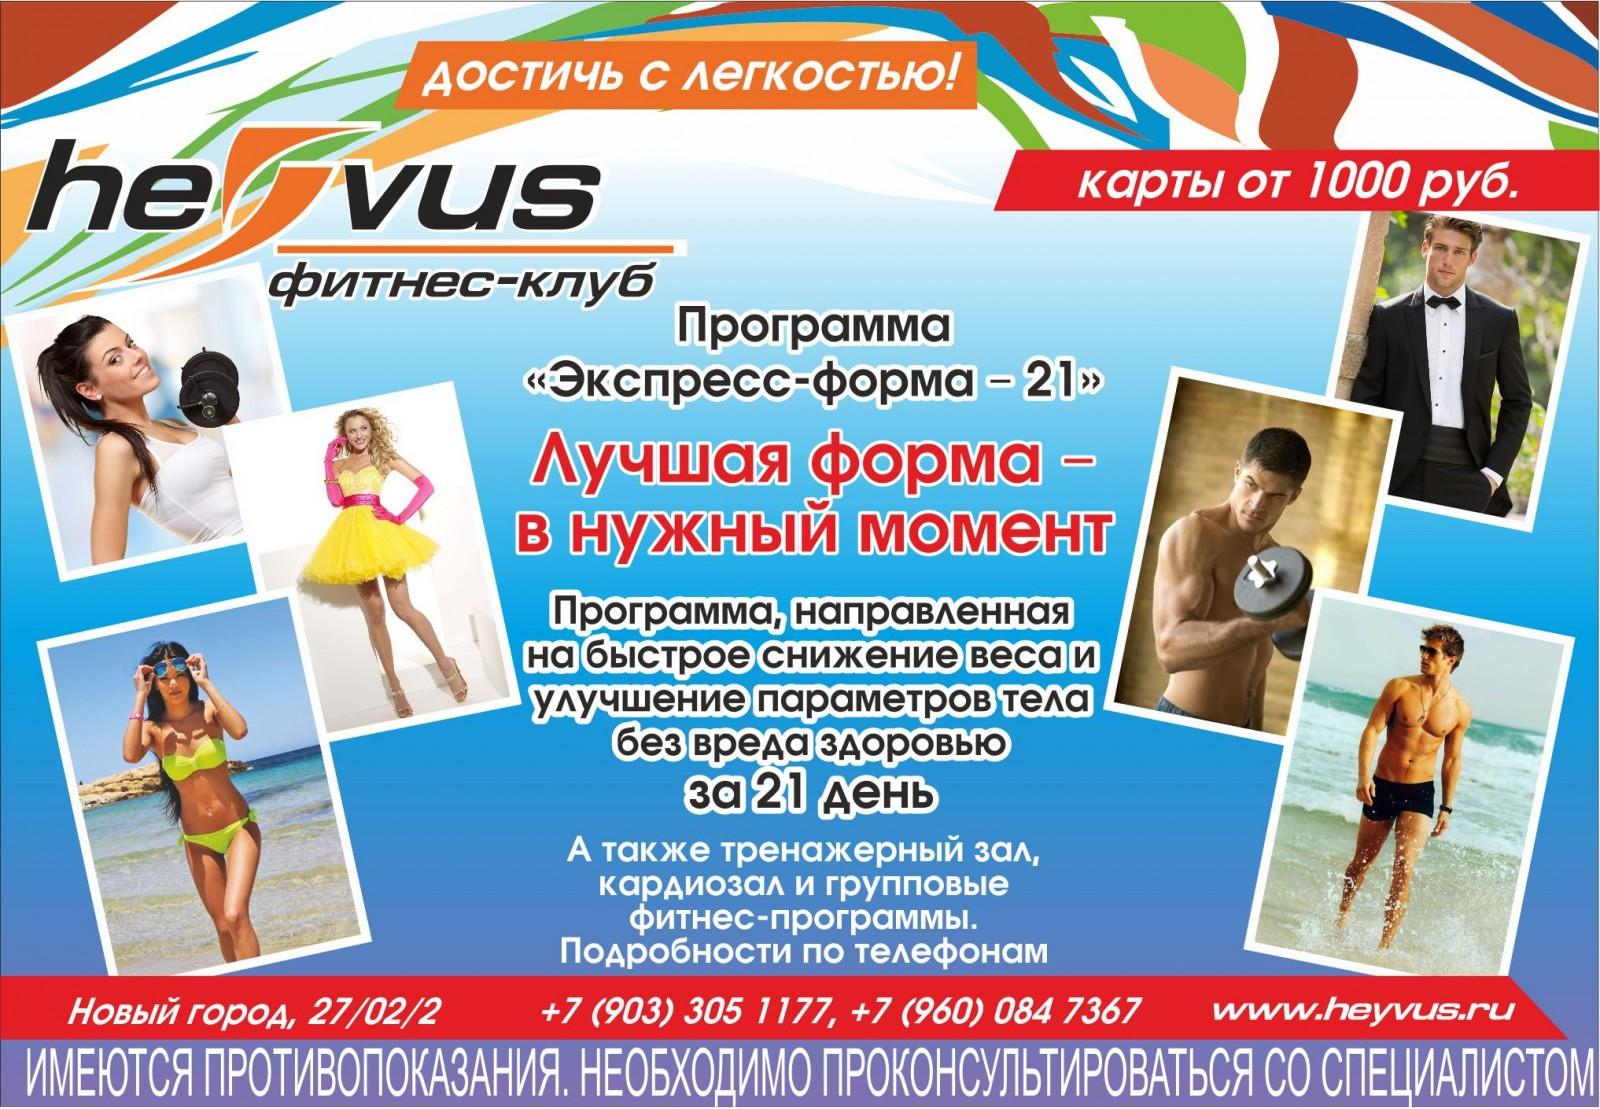 paren-krasivo-razdevaetsya-video